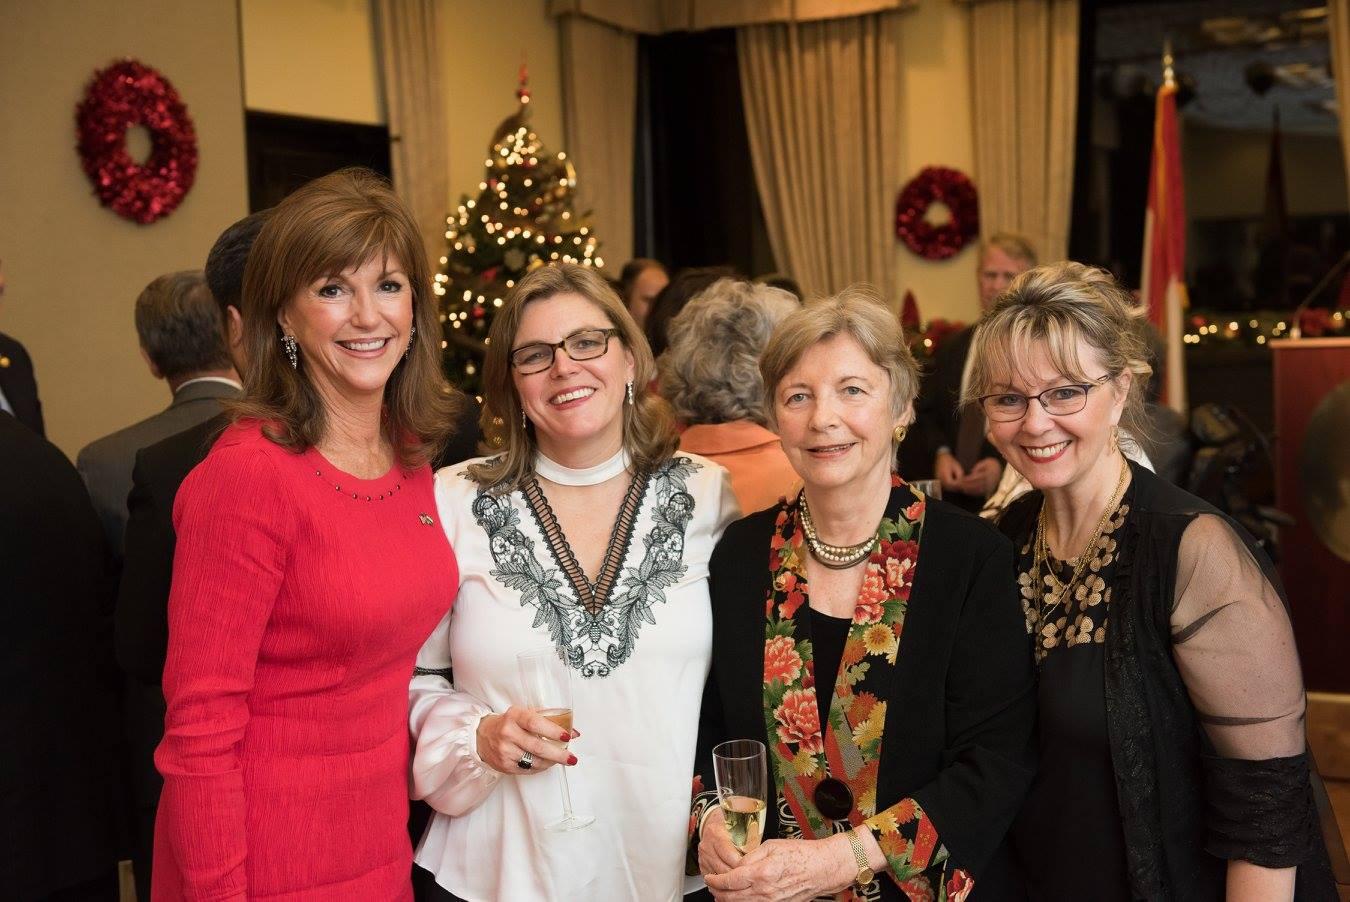 Ms. Susan Hutchison, Coalition President Mrs. Andrea Lauer Rice, Coalition Chair Emerita Mrs. Edith K. Lauer, Coalition Vice President Ms. Csilla Grauzer